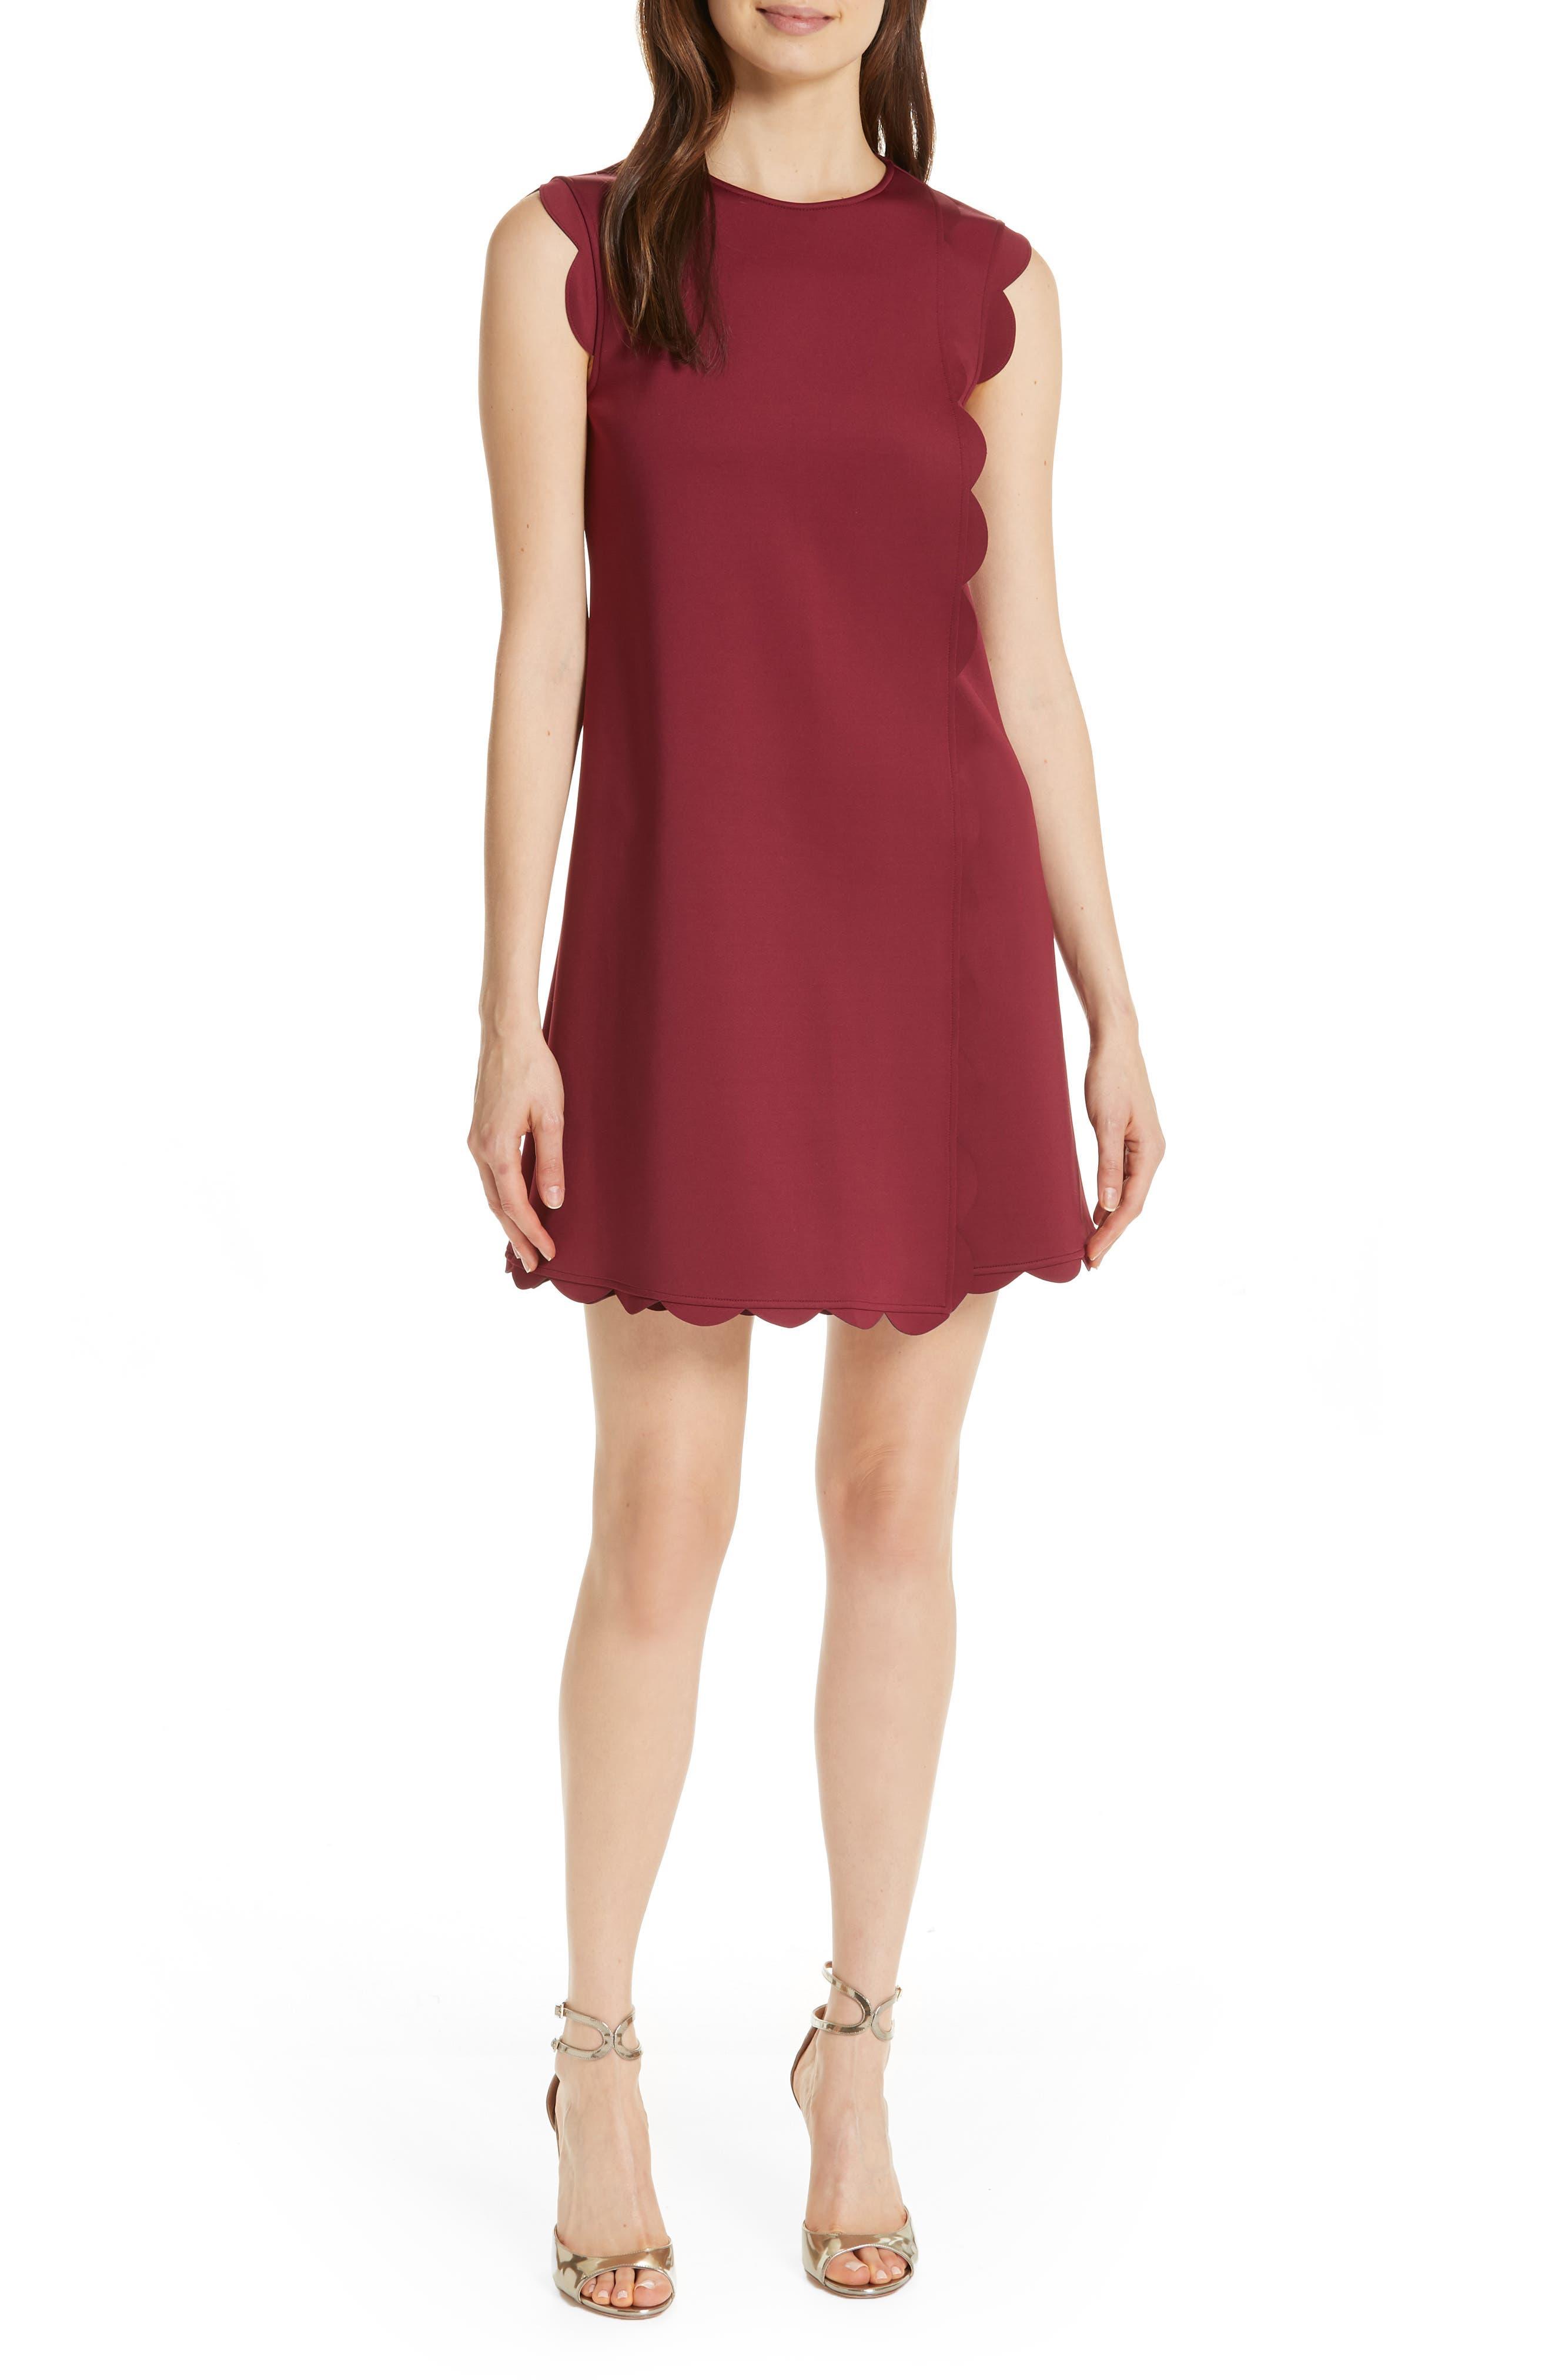 Ted Baker London Jasmint Scallop Overlay Dress, Burgundy